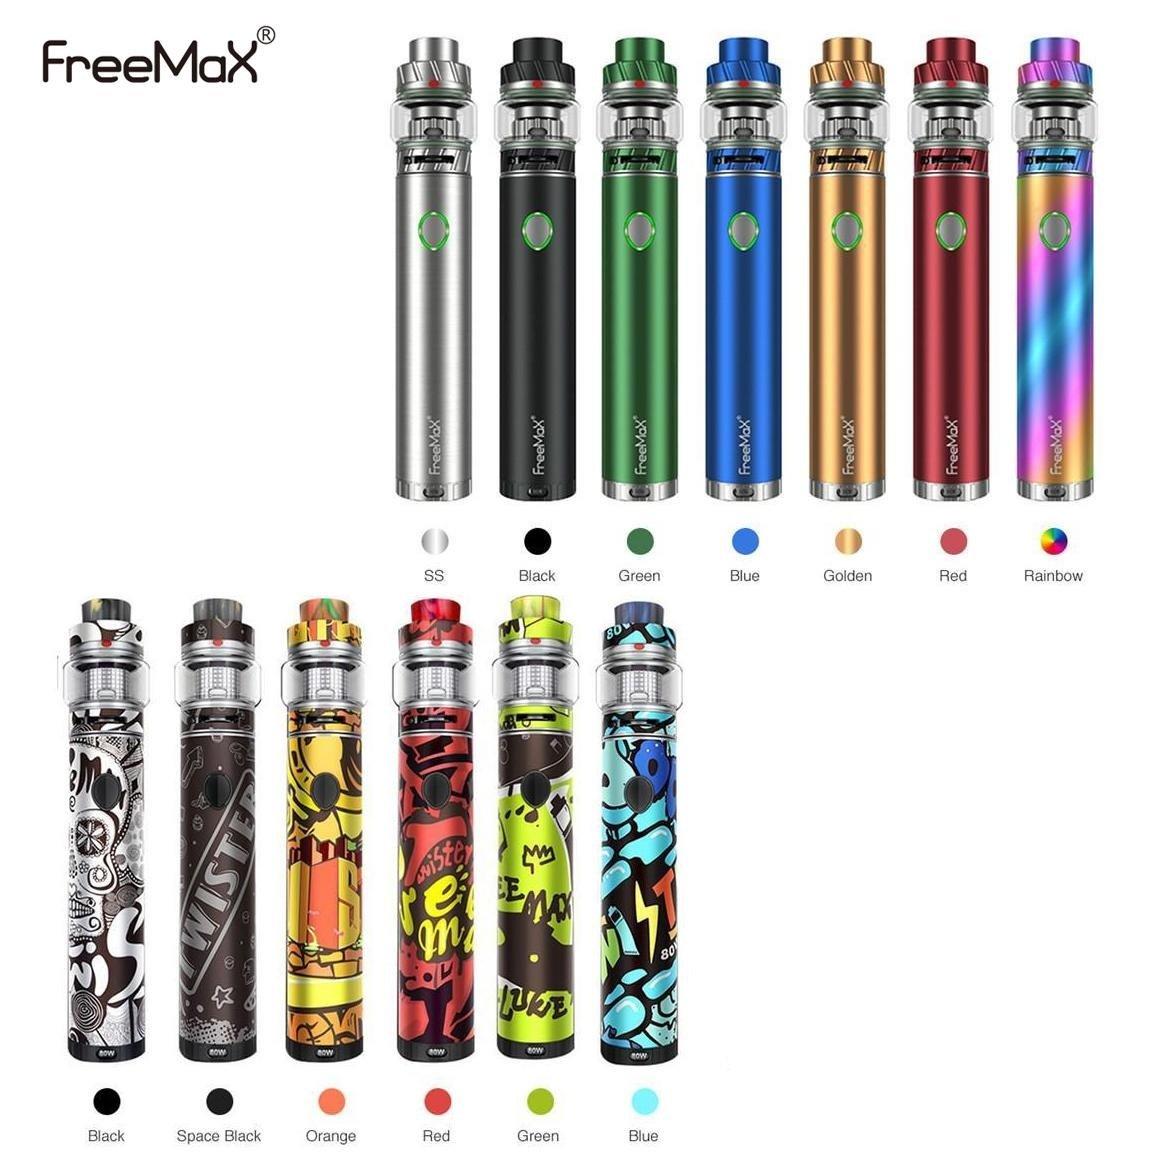 Freemax Twister Kit UK